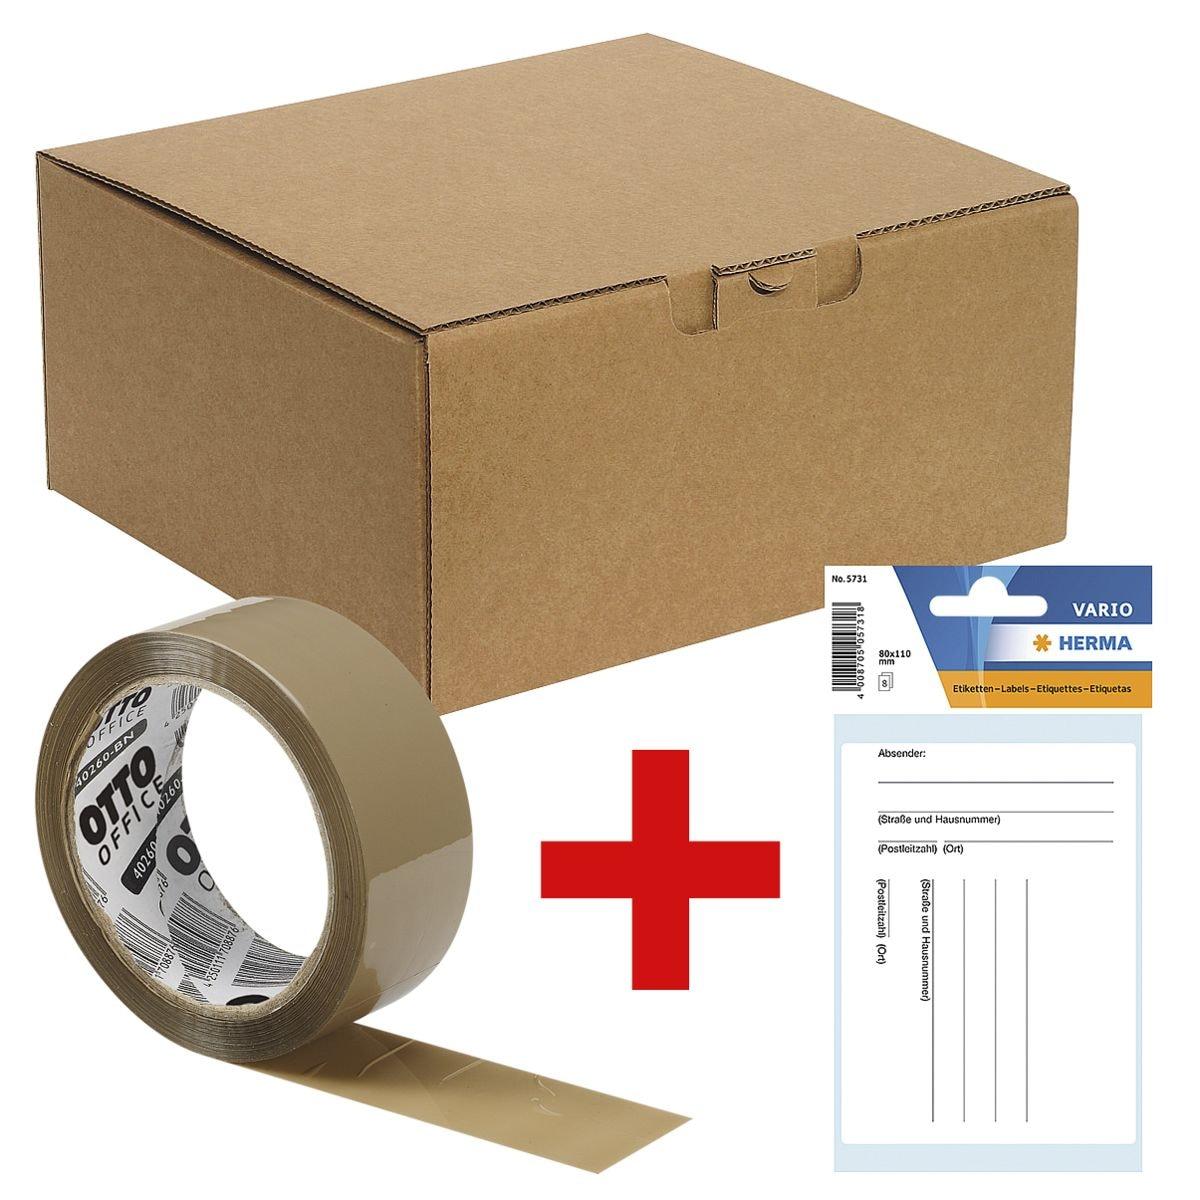 Ordner-Versandkartons 32,3/29,0/15,0 cm - 10 Stück inkl. Packband »Standard« inkl. Paketadressen/Versandzettel »5731«